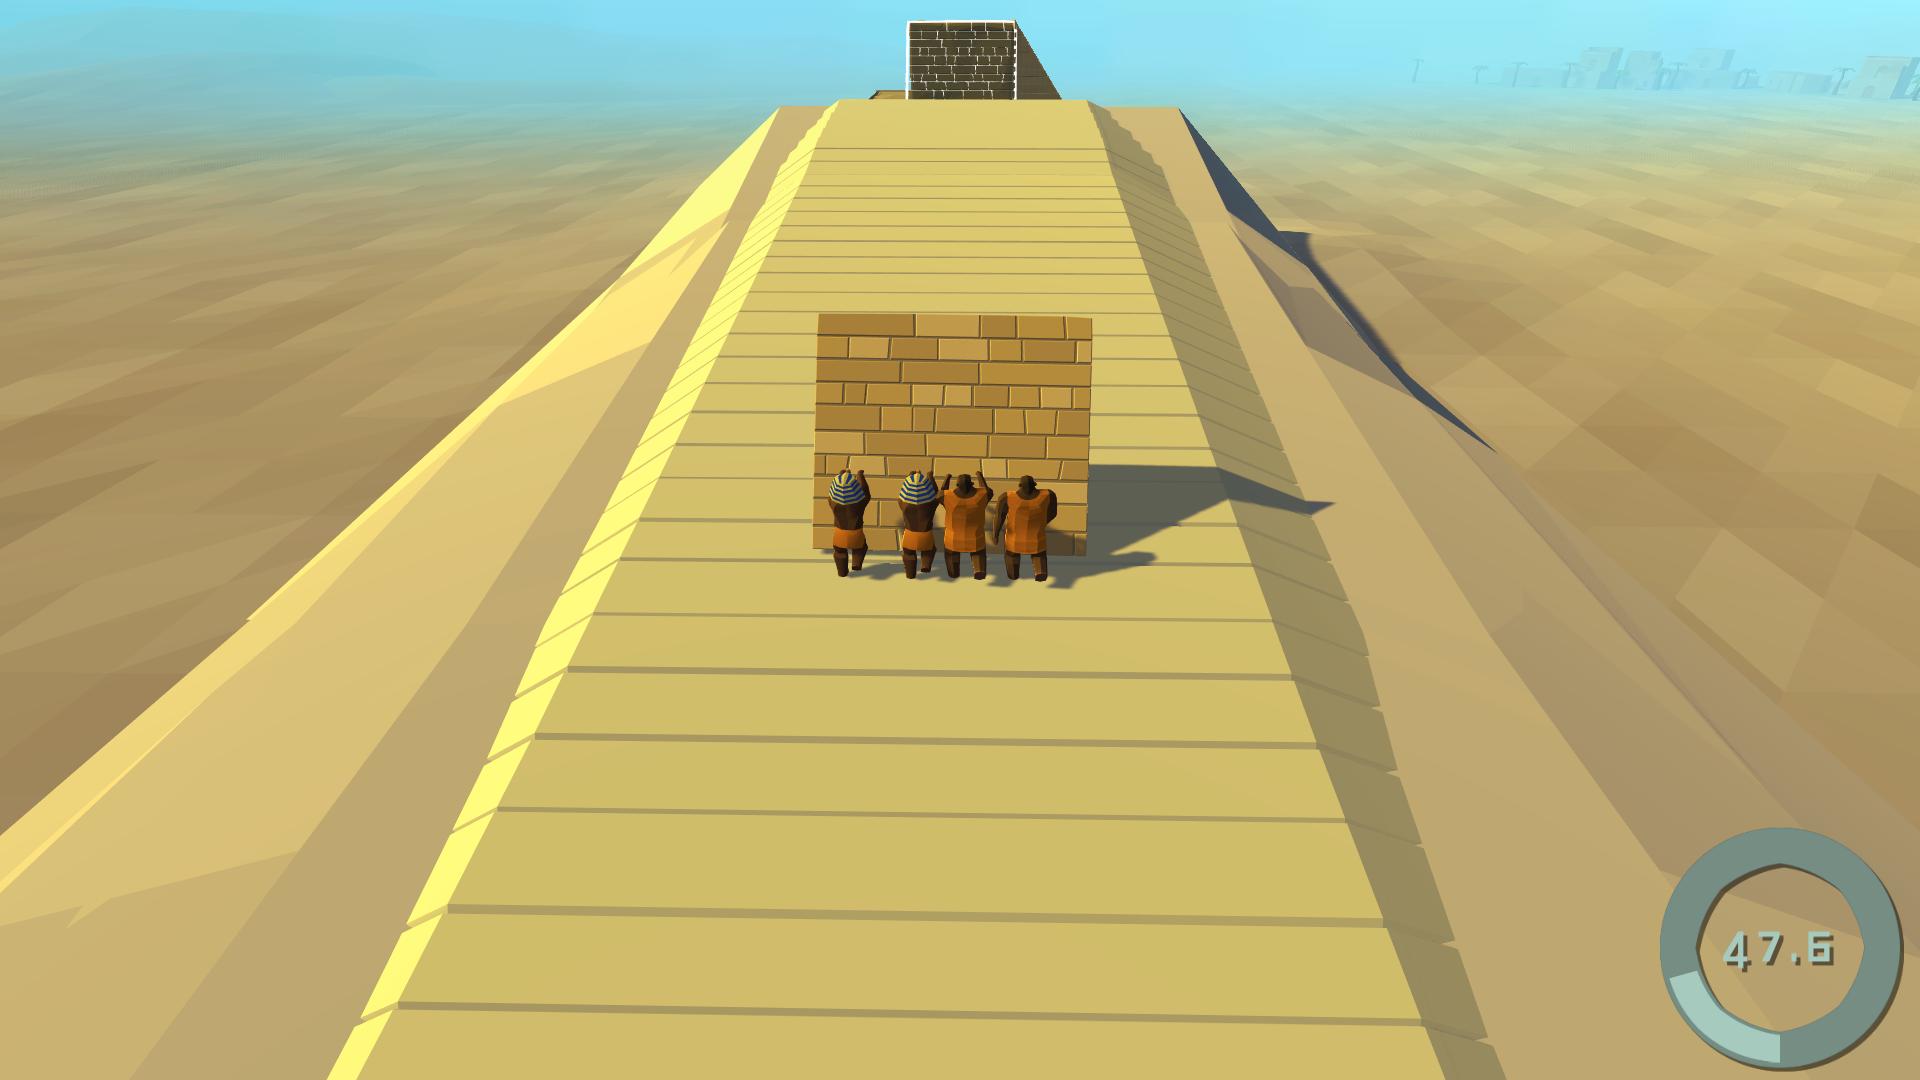 MonumentalFailure_Pyramid_01.png